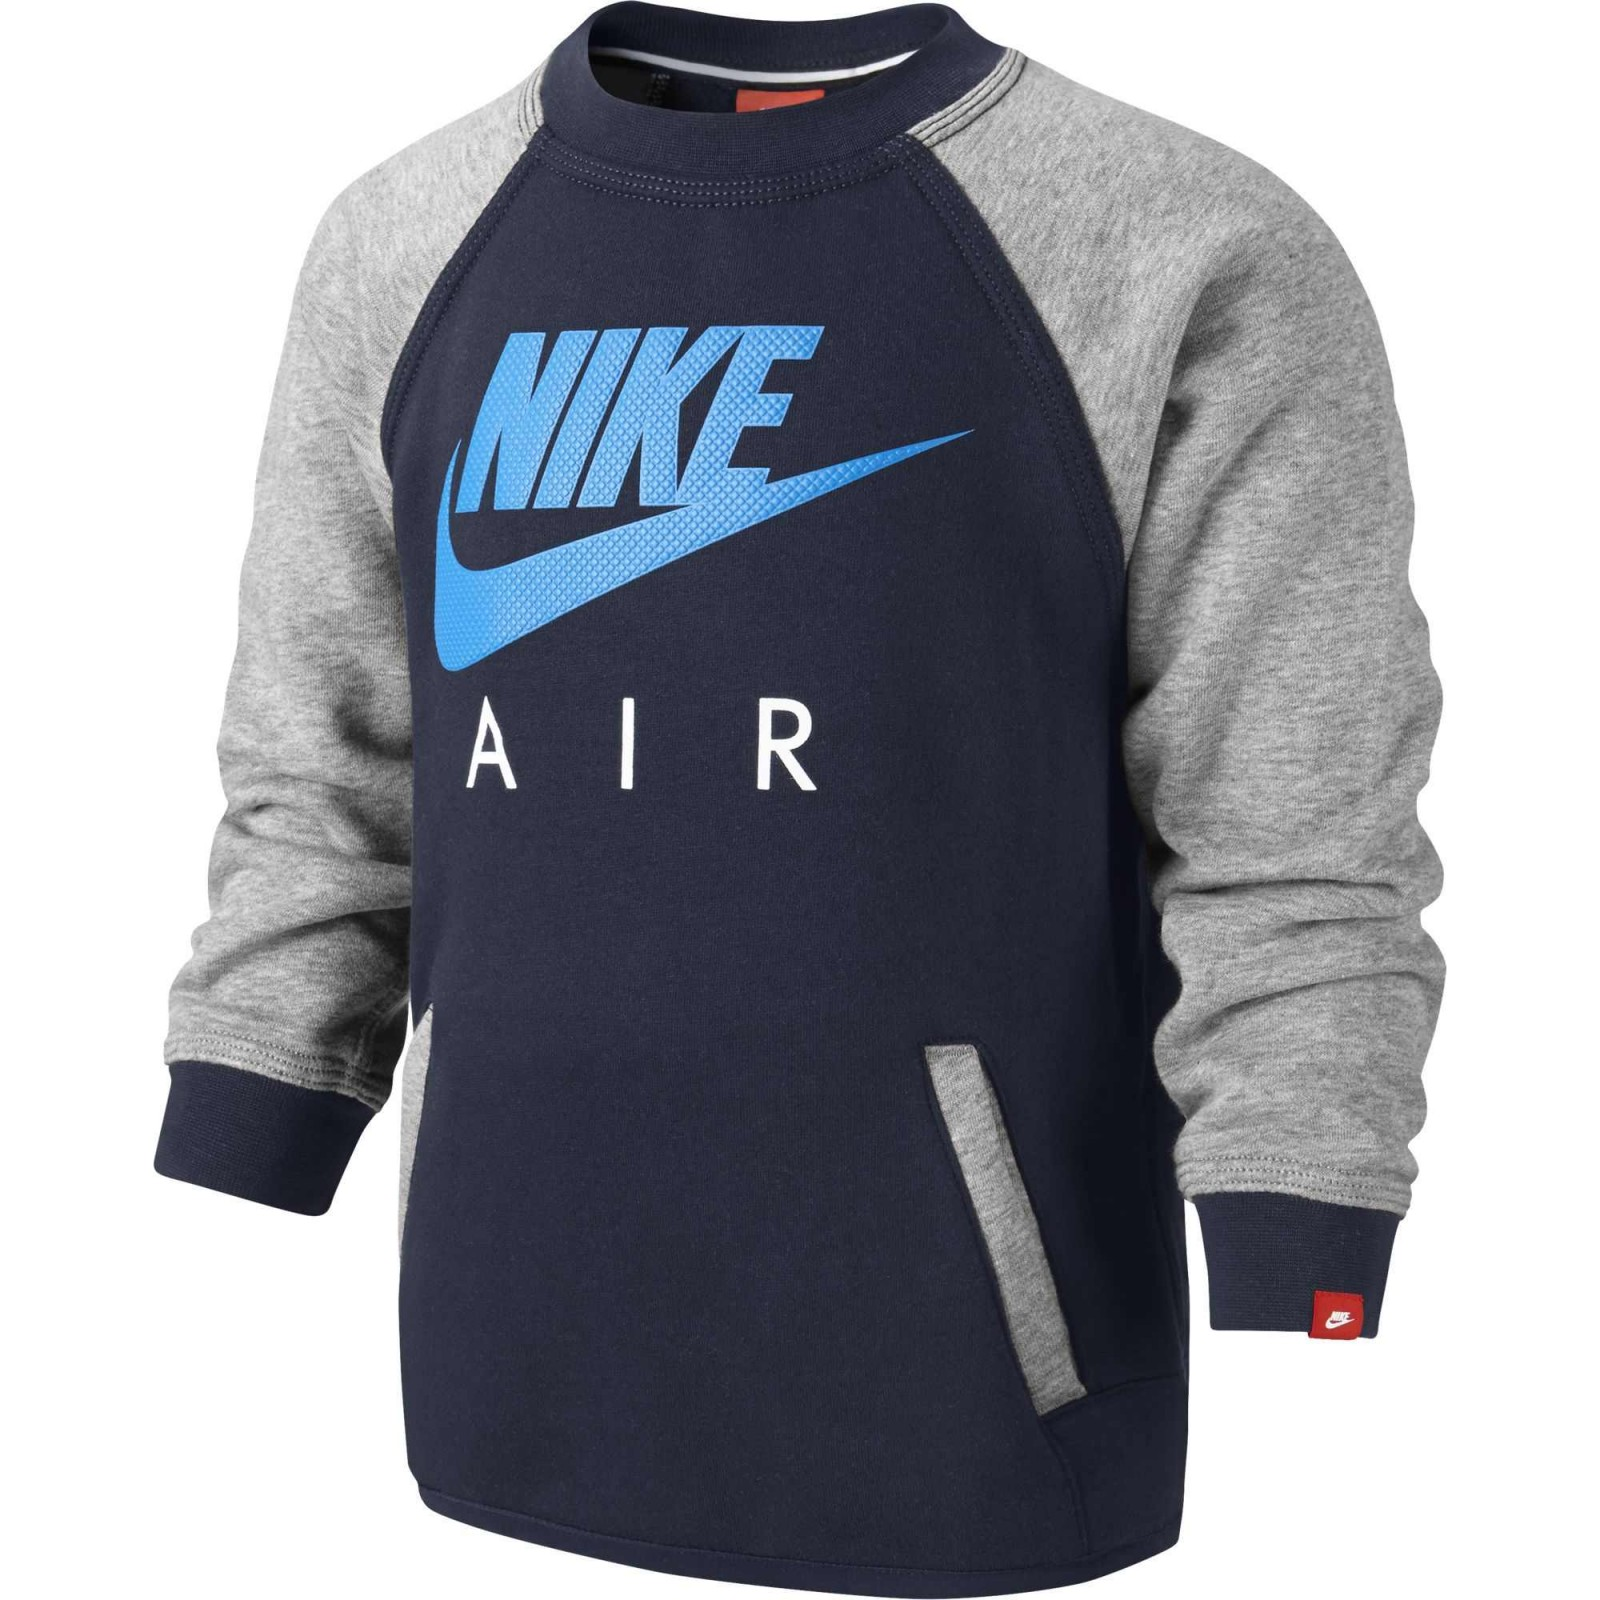 7d897f1a26b Dětská mikina Nike YA BF HBR CREW -AIR LK